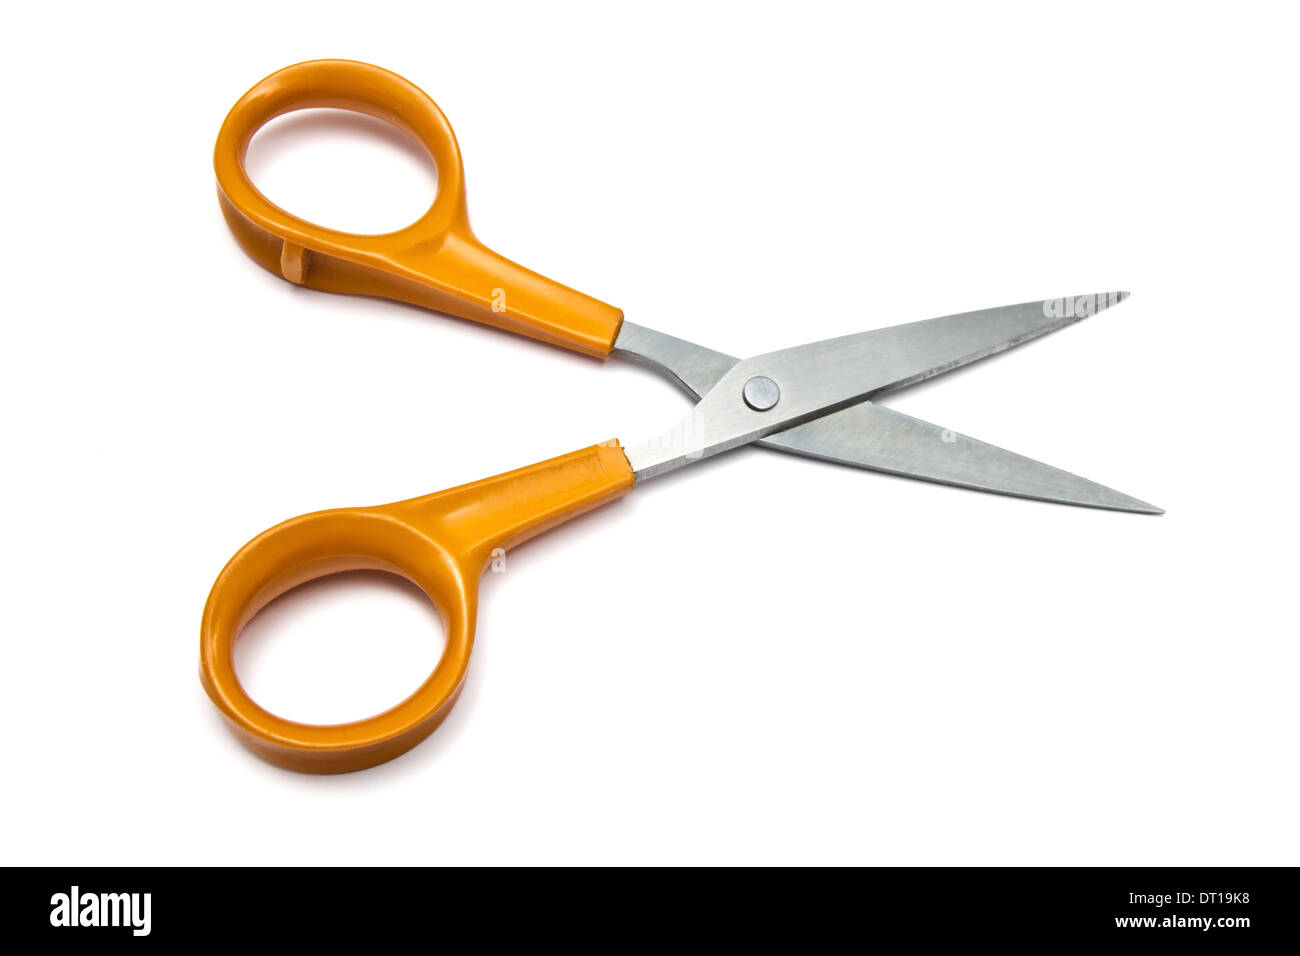 Handled scissors - Stock Image